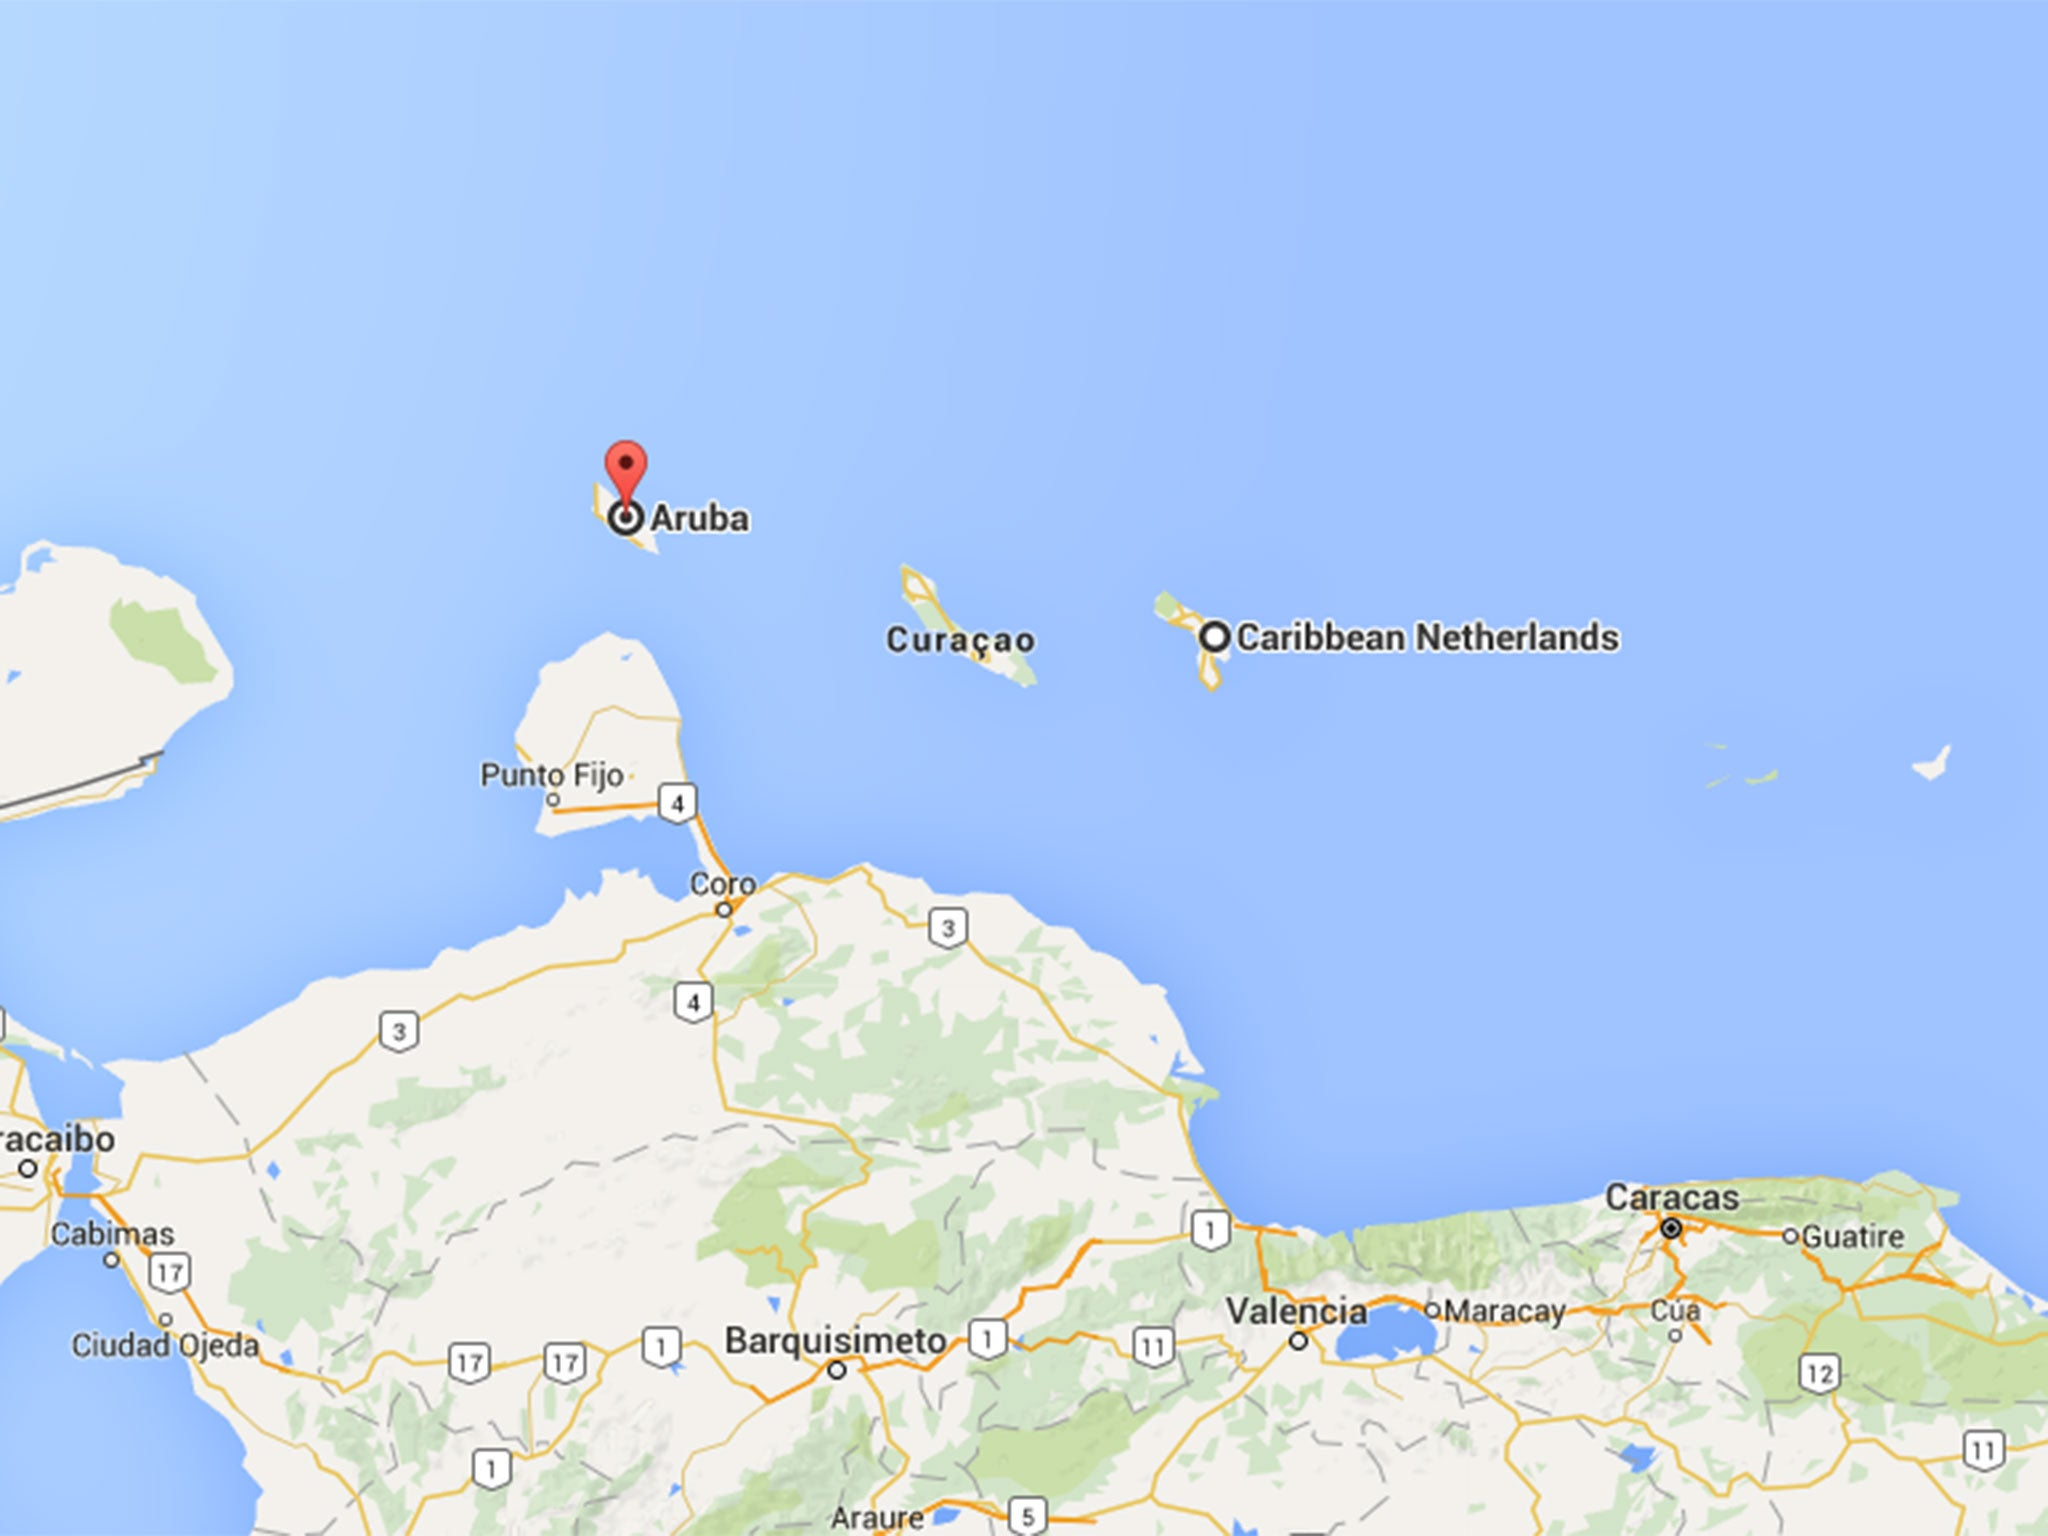 Shark attack kills Venezuelan man after boat capsizes near Aruba